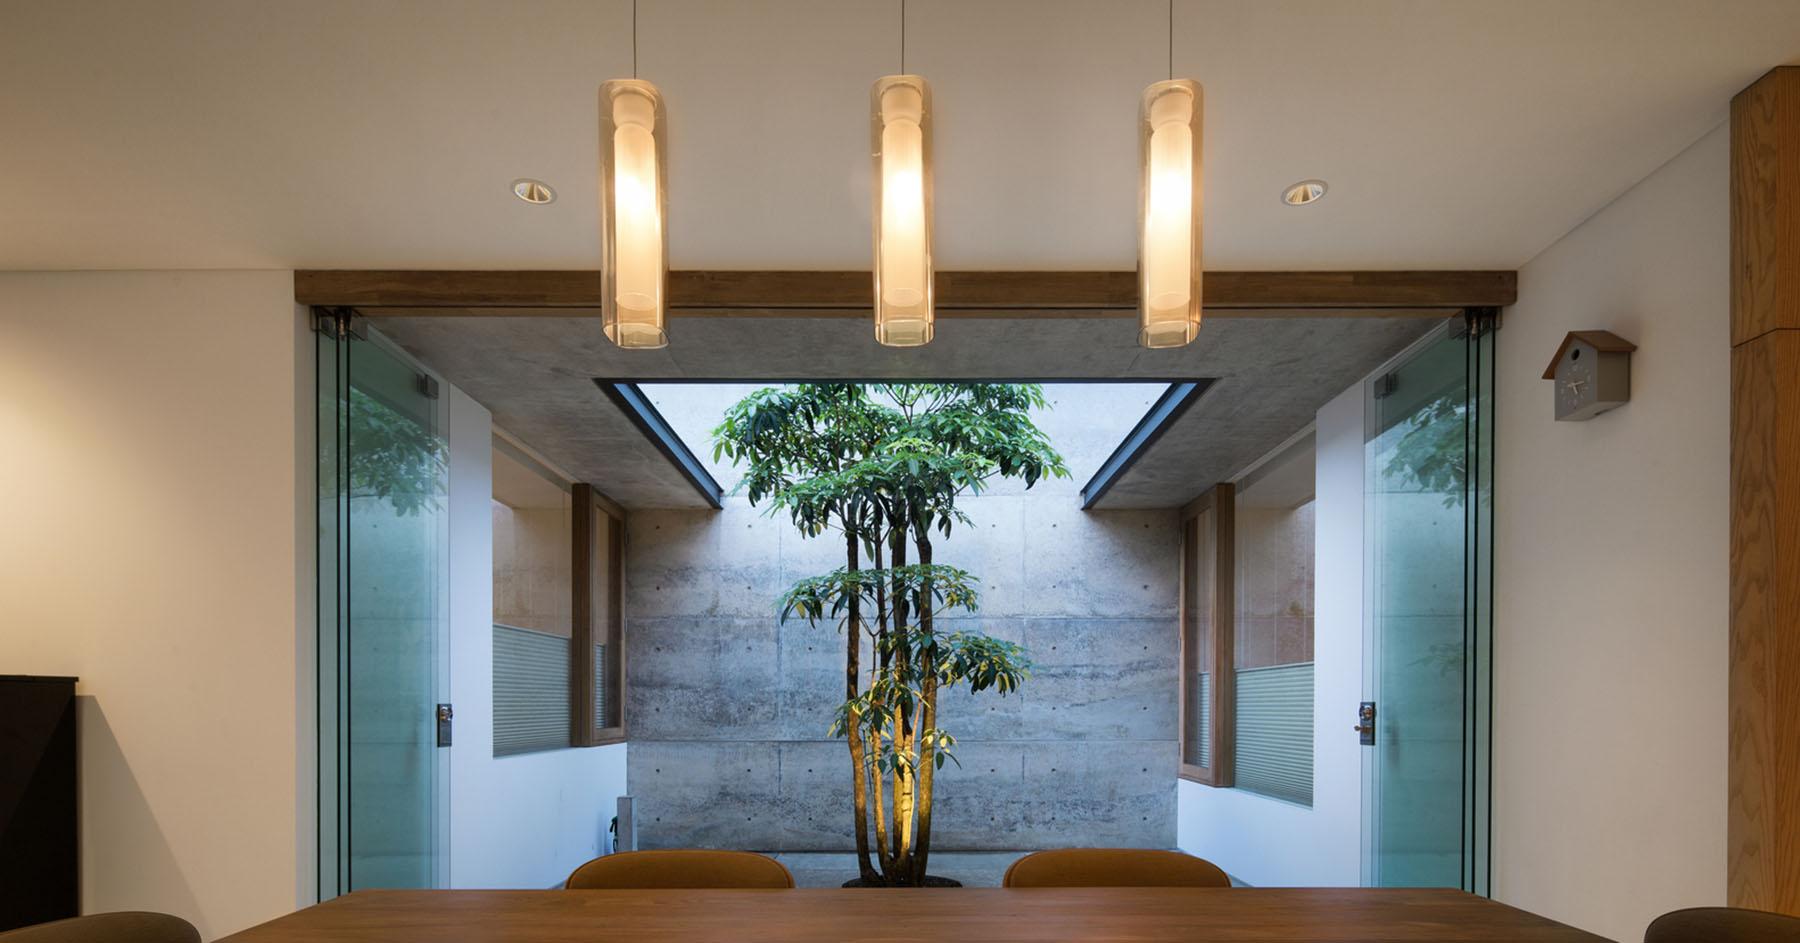 iGNANT-Architecture-Pranala-Associates-Hikari-House-007